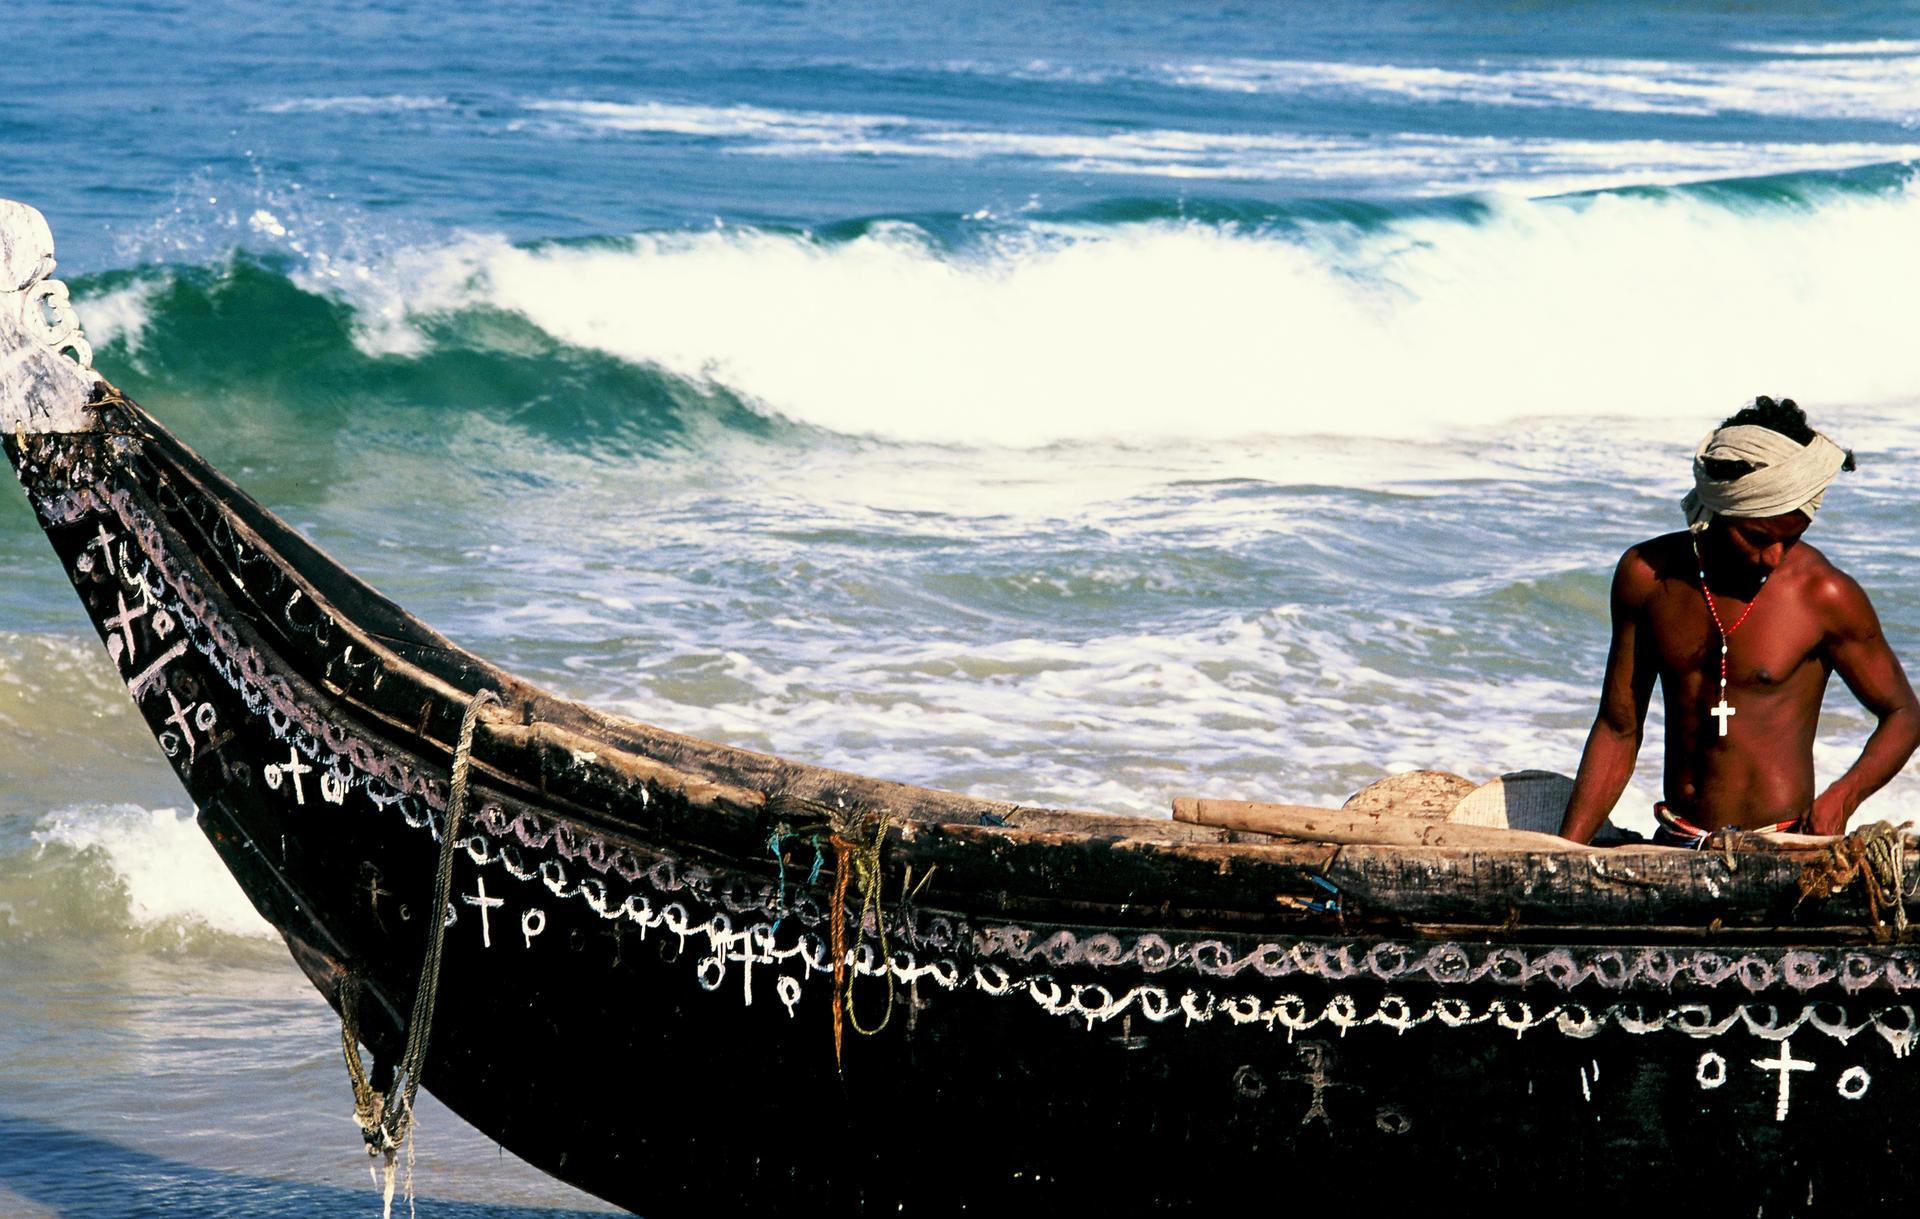 Keralan fisherman 2 crop.jpg